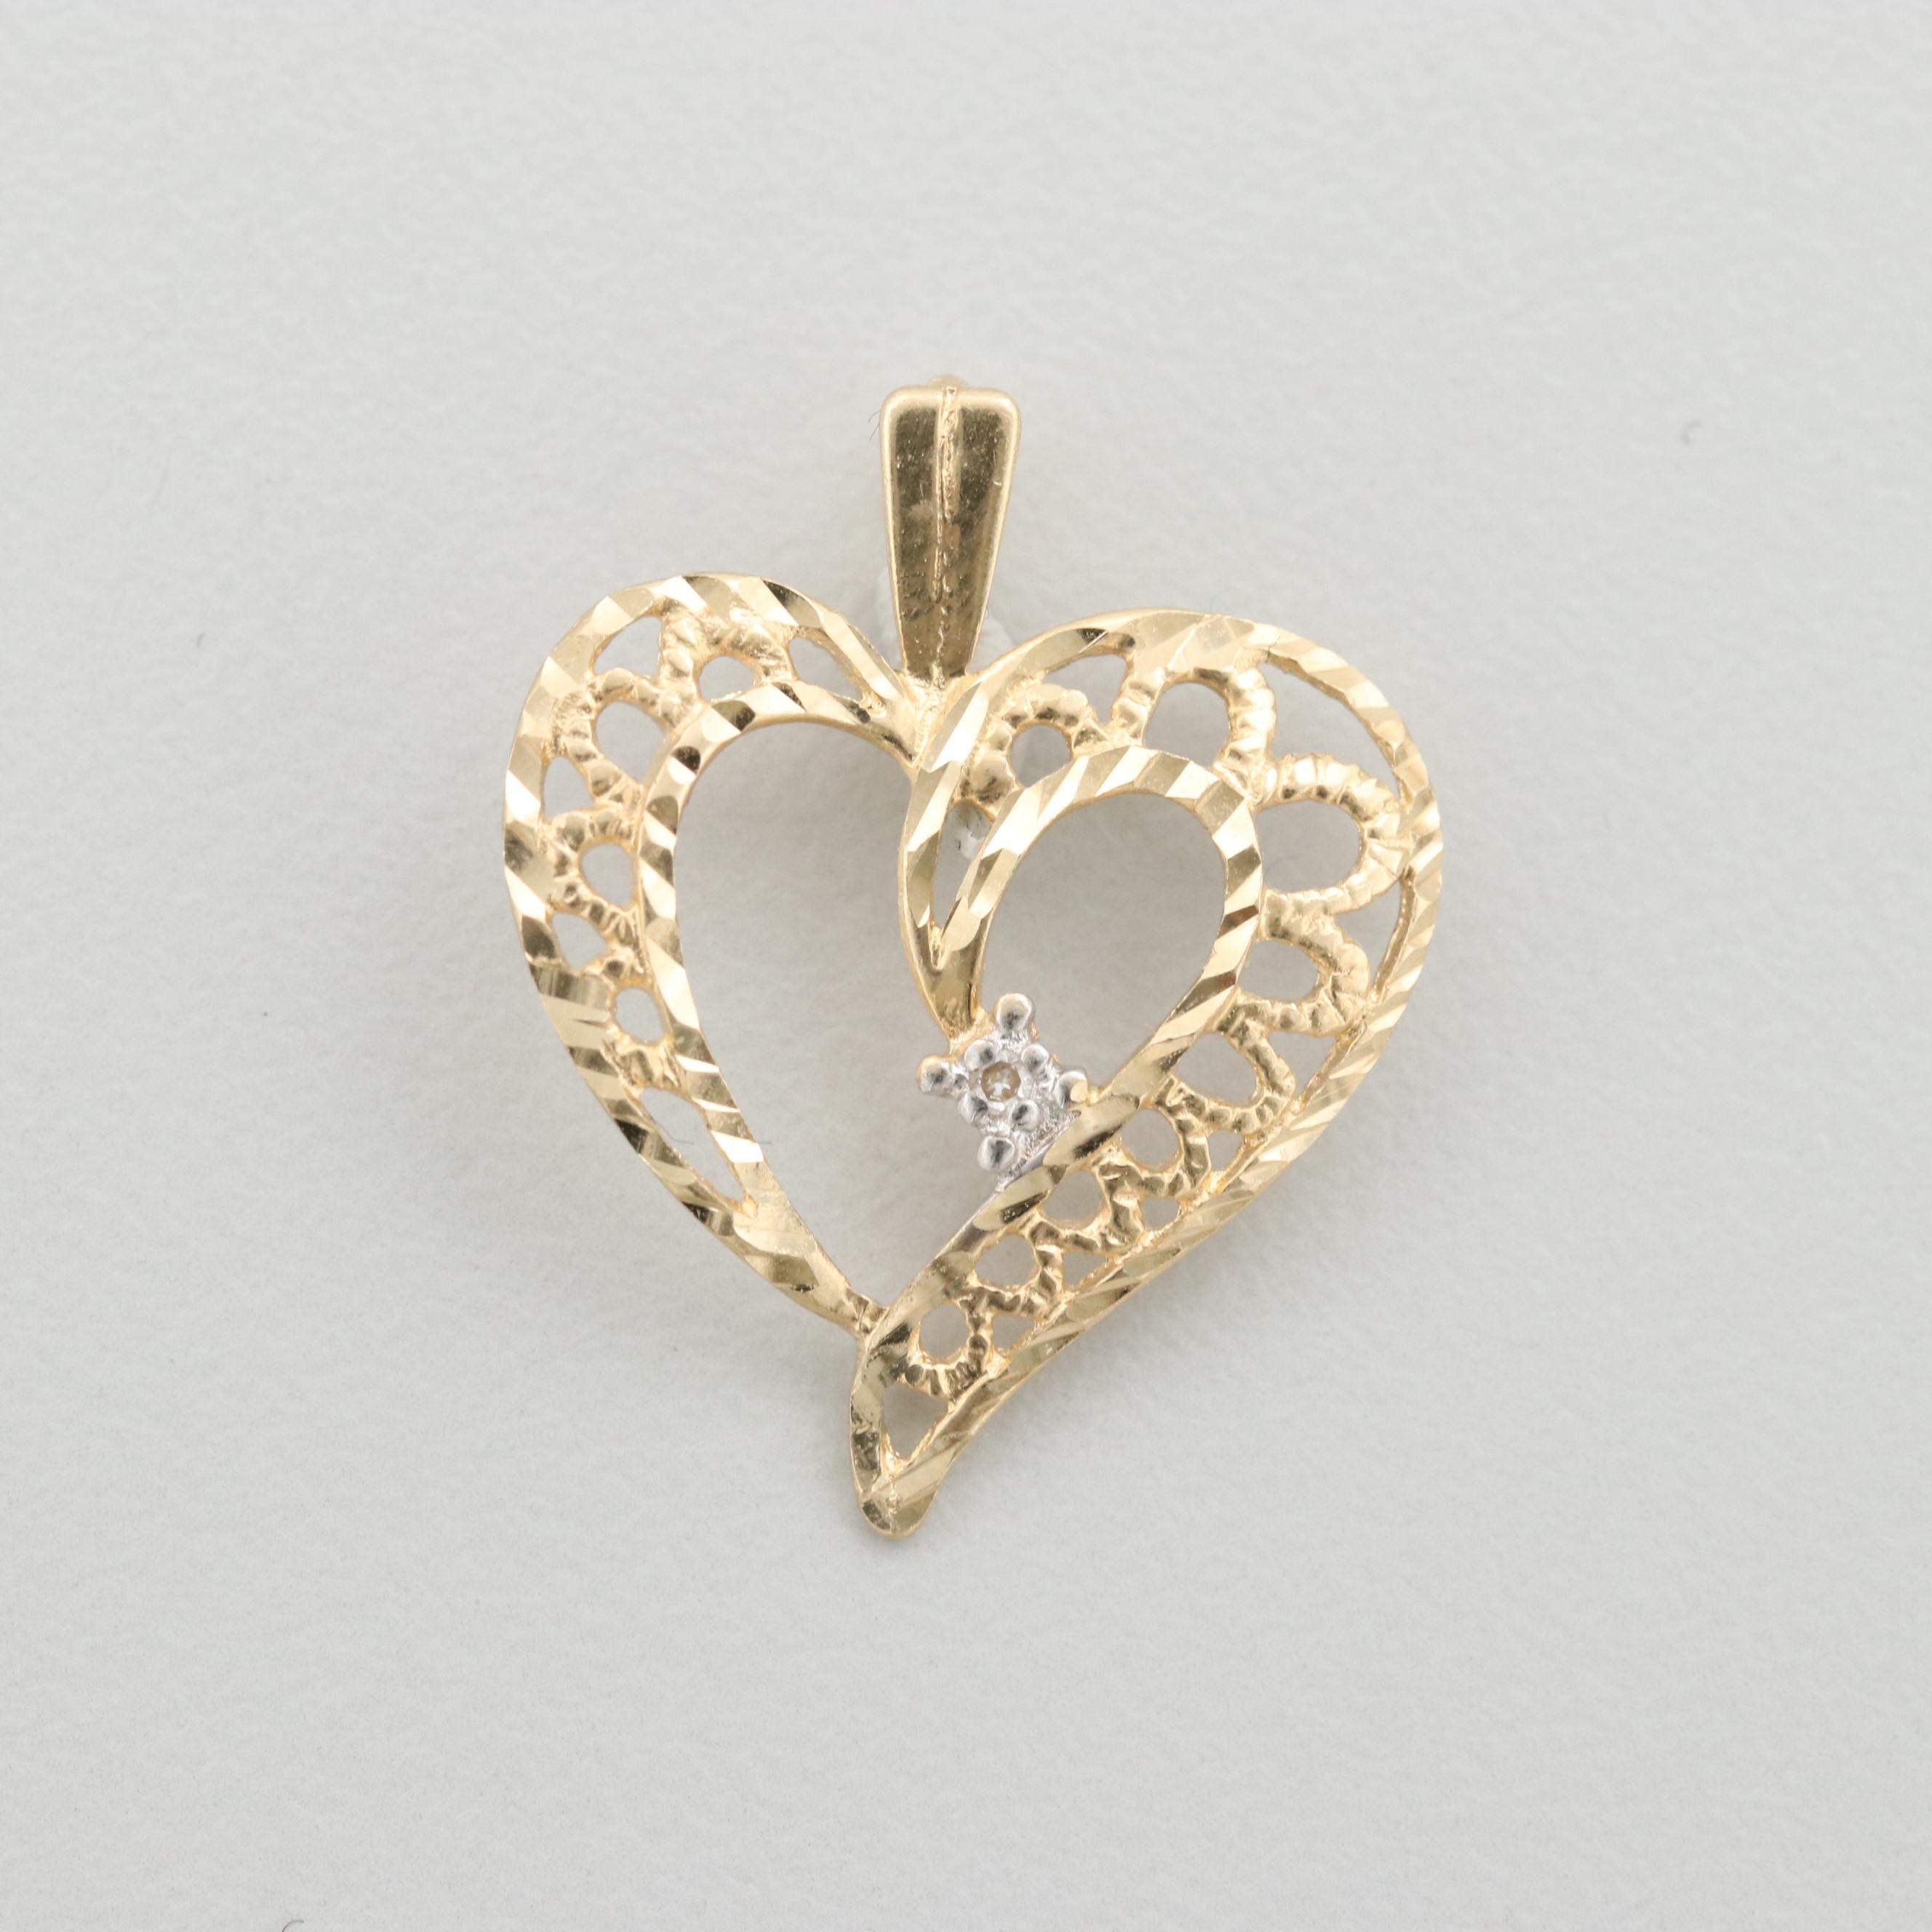 14K Yellow Gold Diamond Openwork Heart Pendant